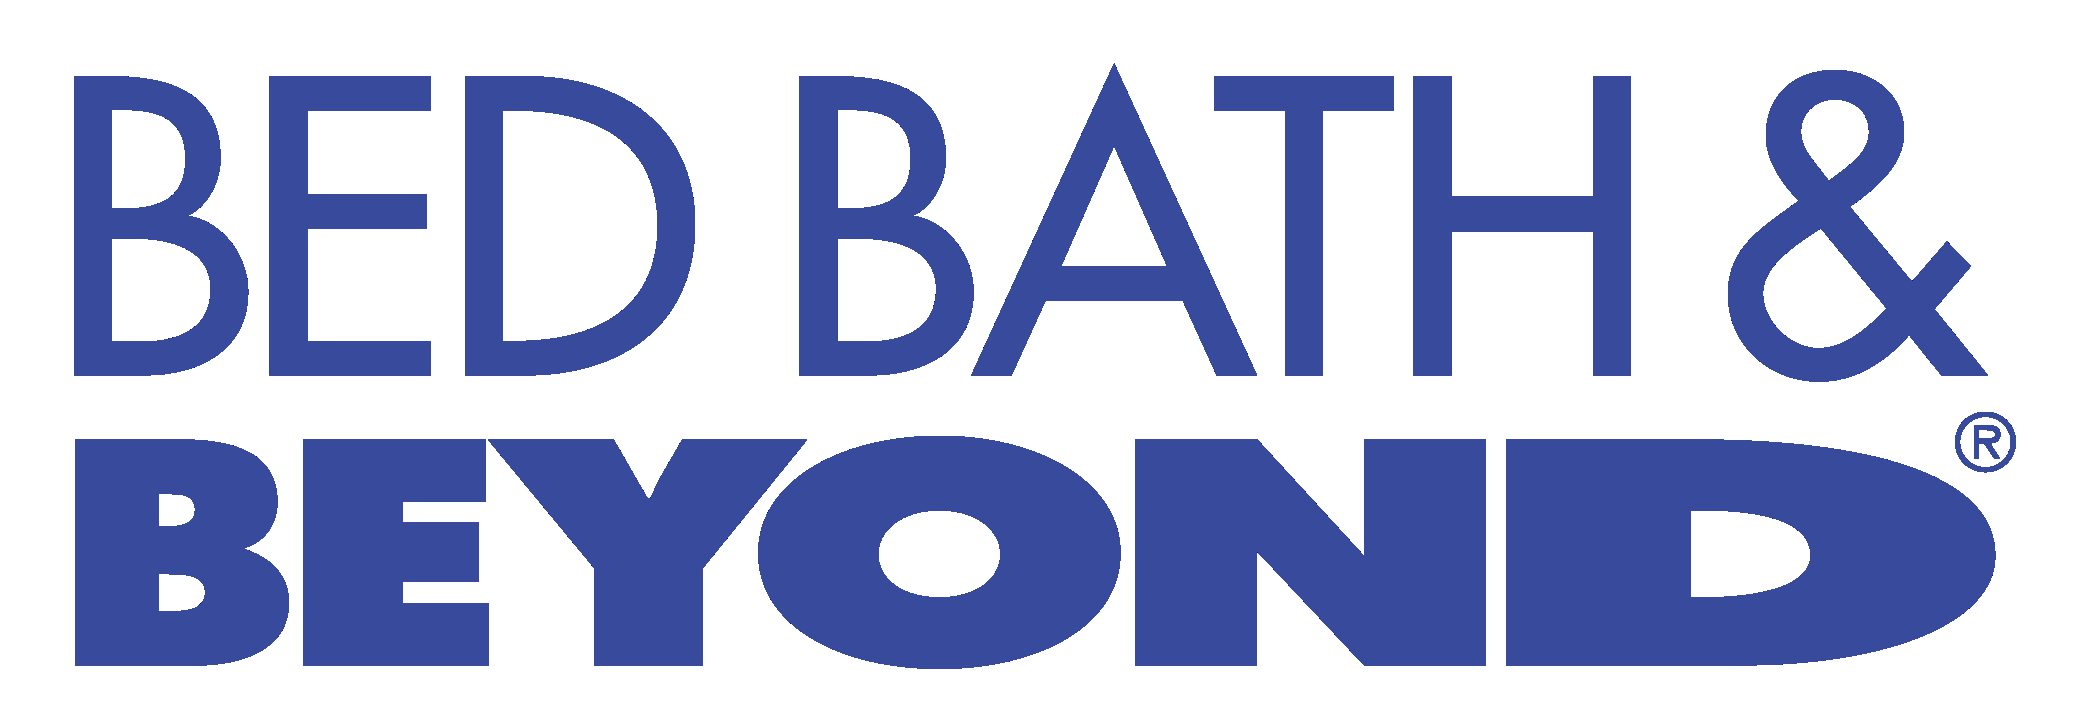 Bed Bath & Beyond Logo PNG Image.